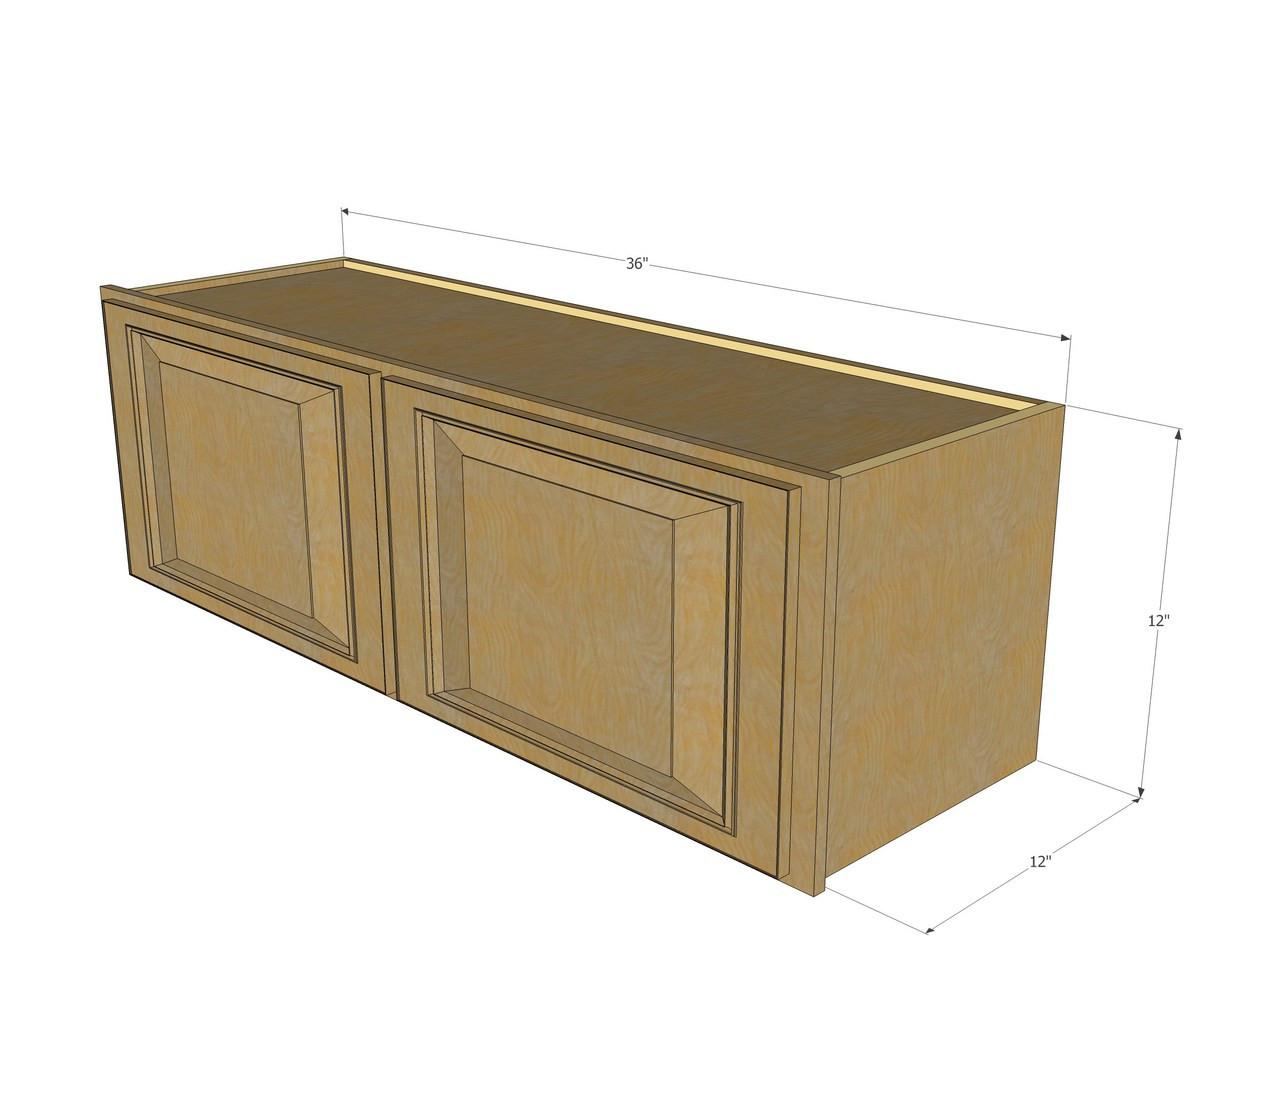 12 Kitchen Cabinets: Regal Oak Horizontal Overhead Wall Cabinet